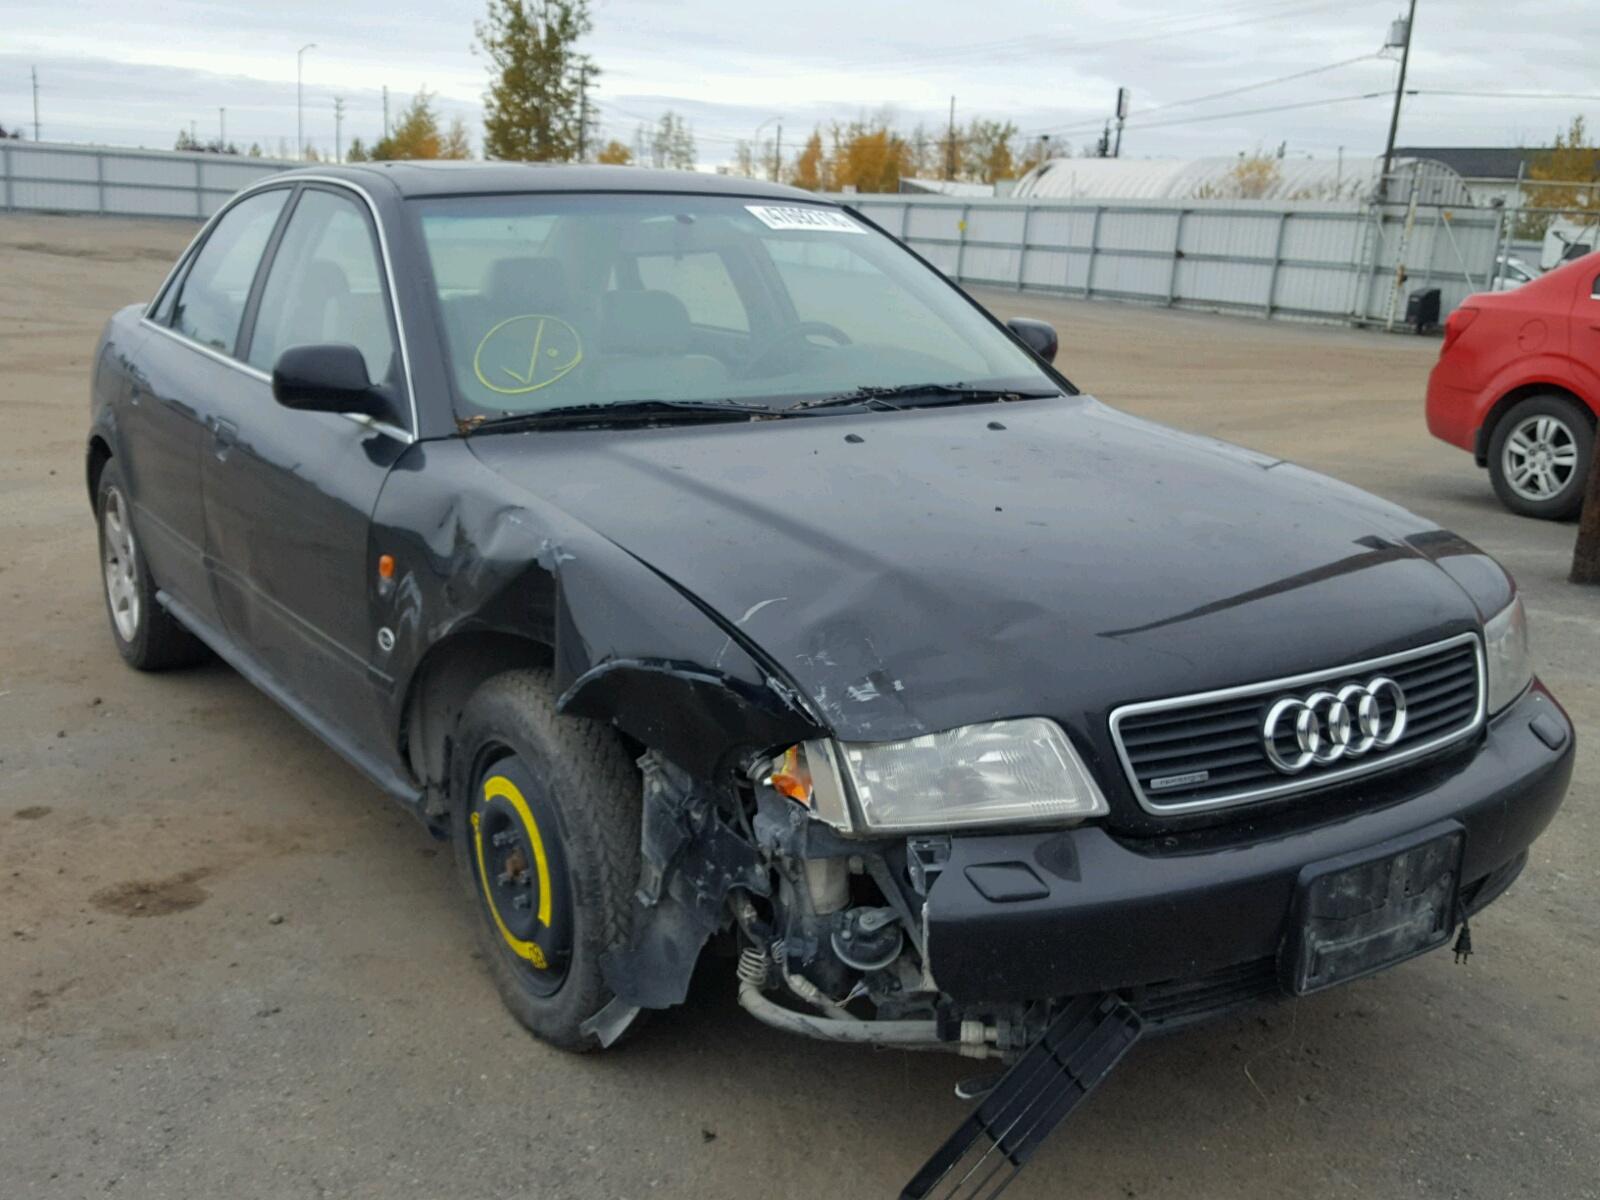 Audi A Quattro For Sale At Copart Anchorage AK Lot - Audi anchorage